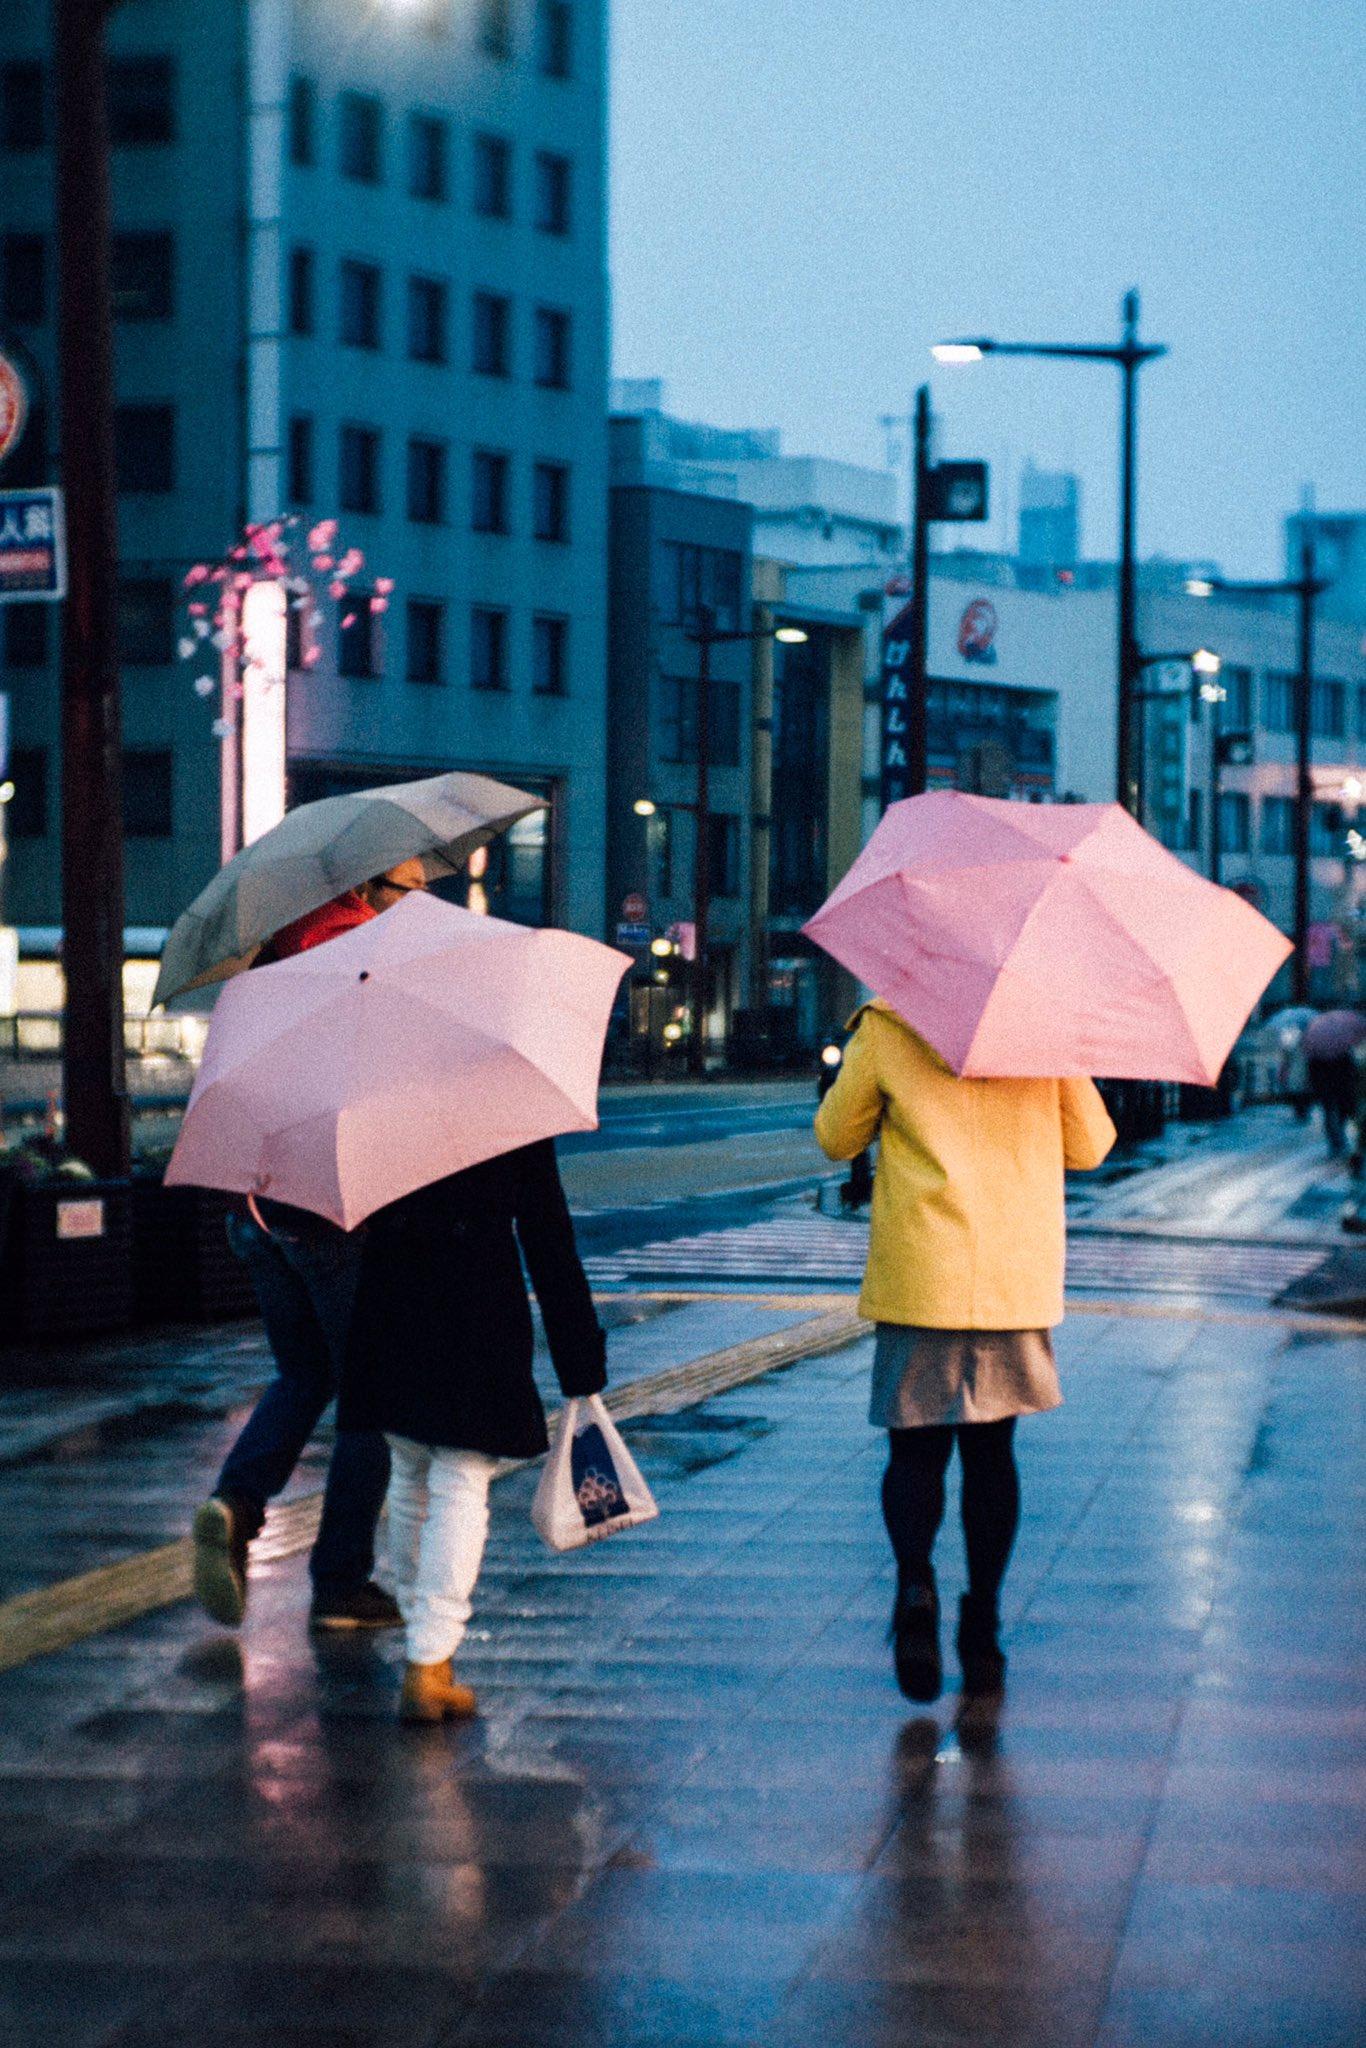 urban_street_photography_35.jpg